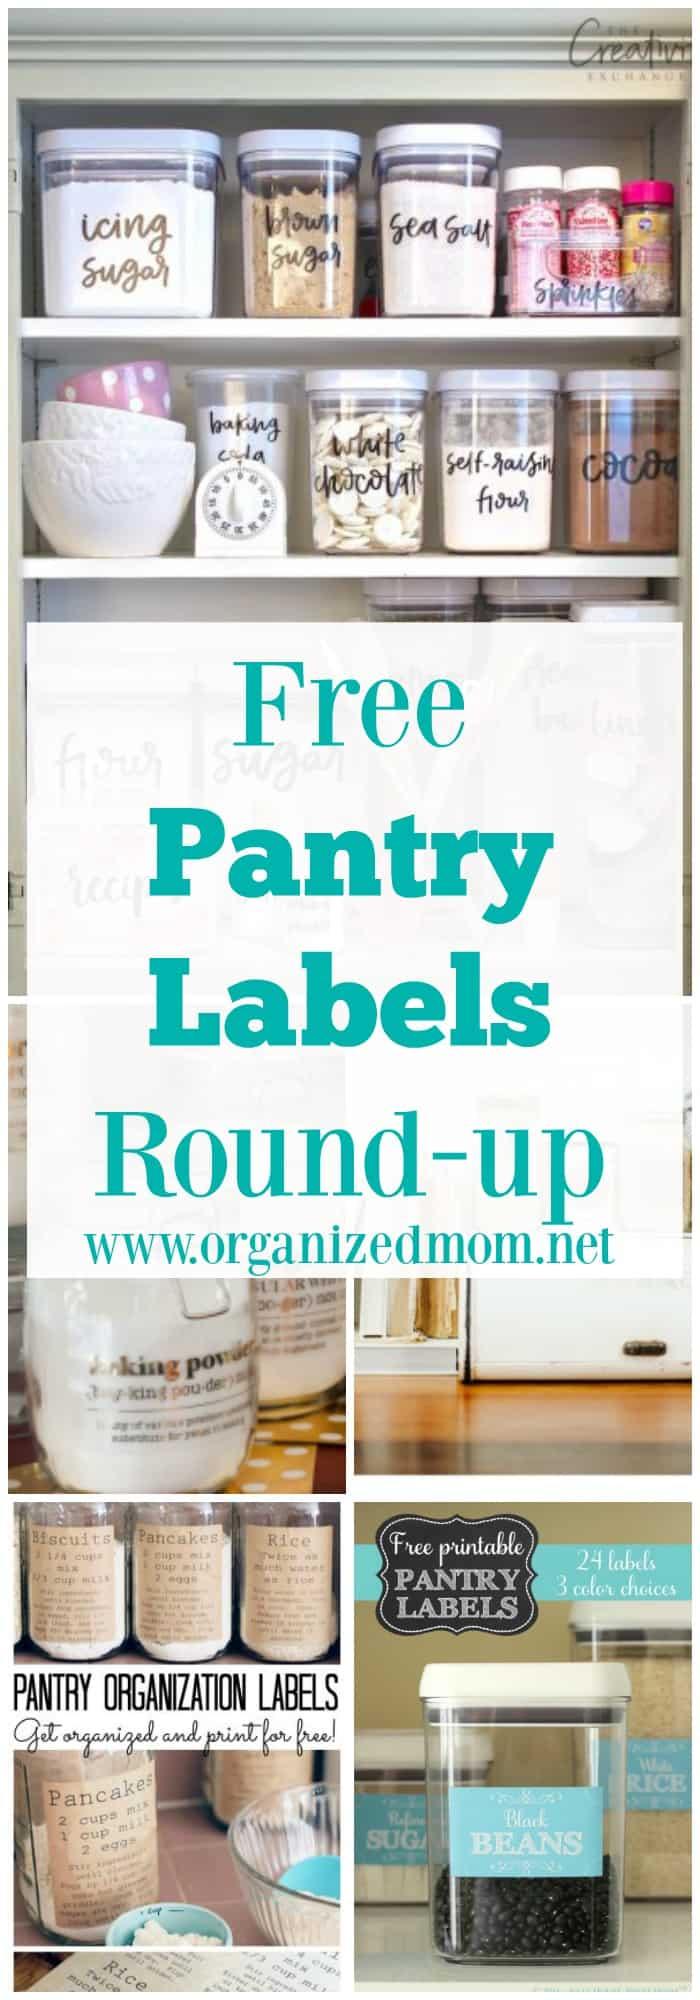 free-pantry-labels-roundup